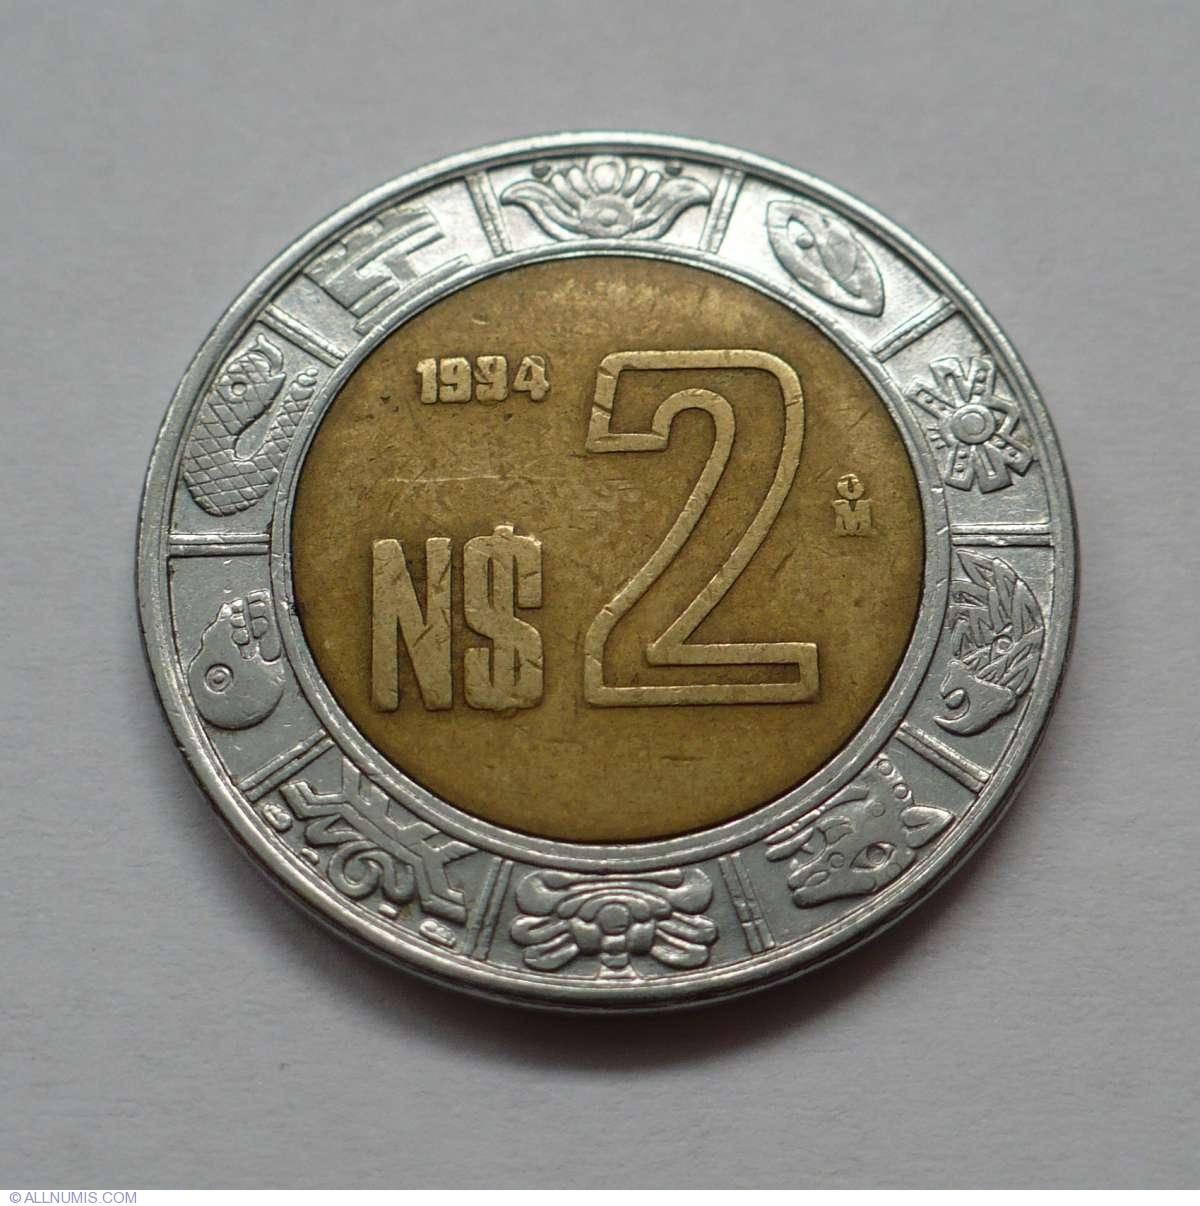 2 Nuevo Pesos 1994 United Mexican States 1991 2000